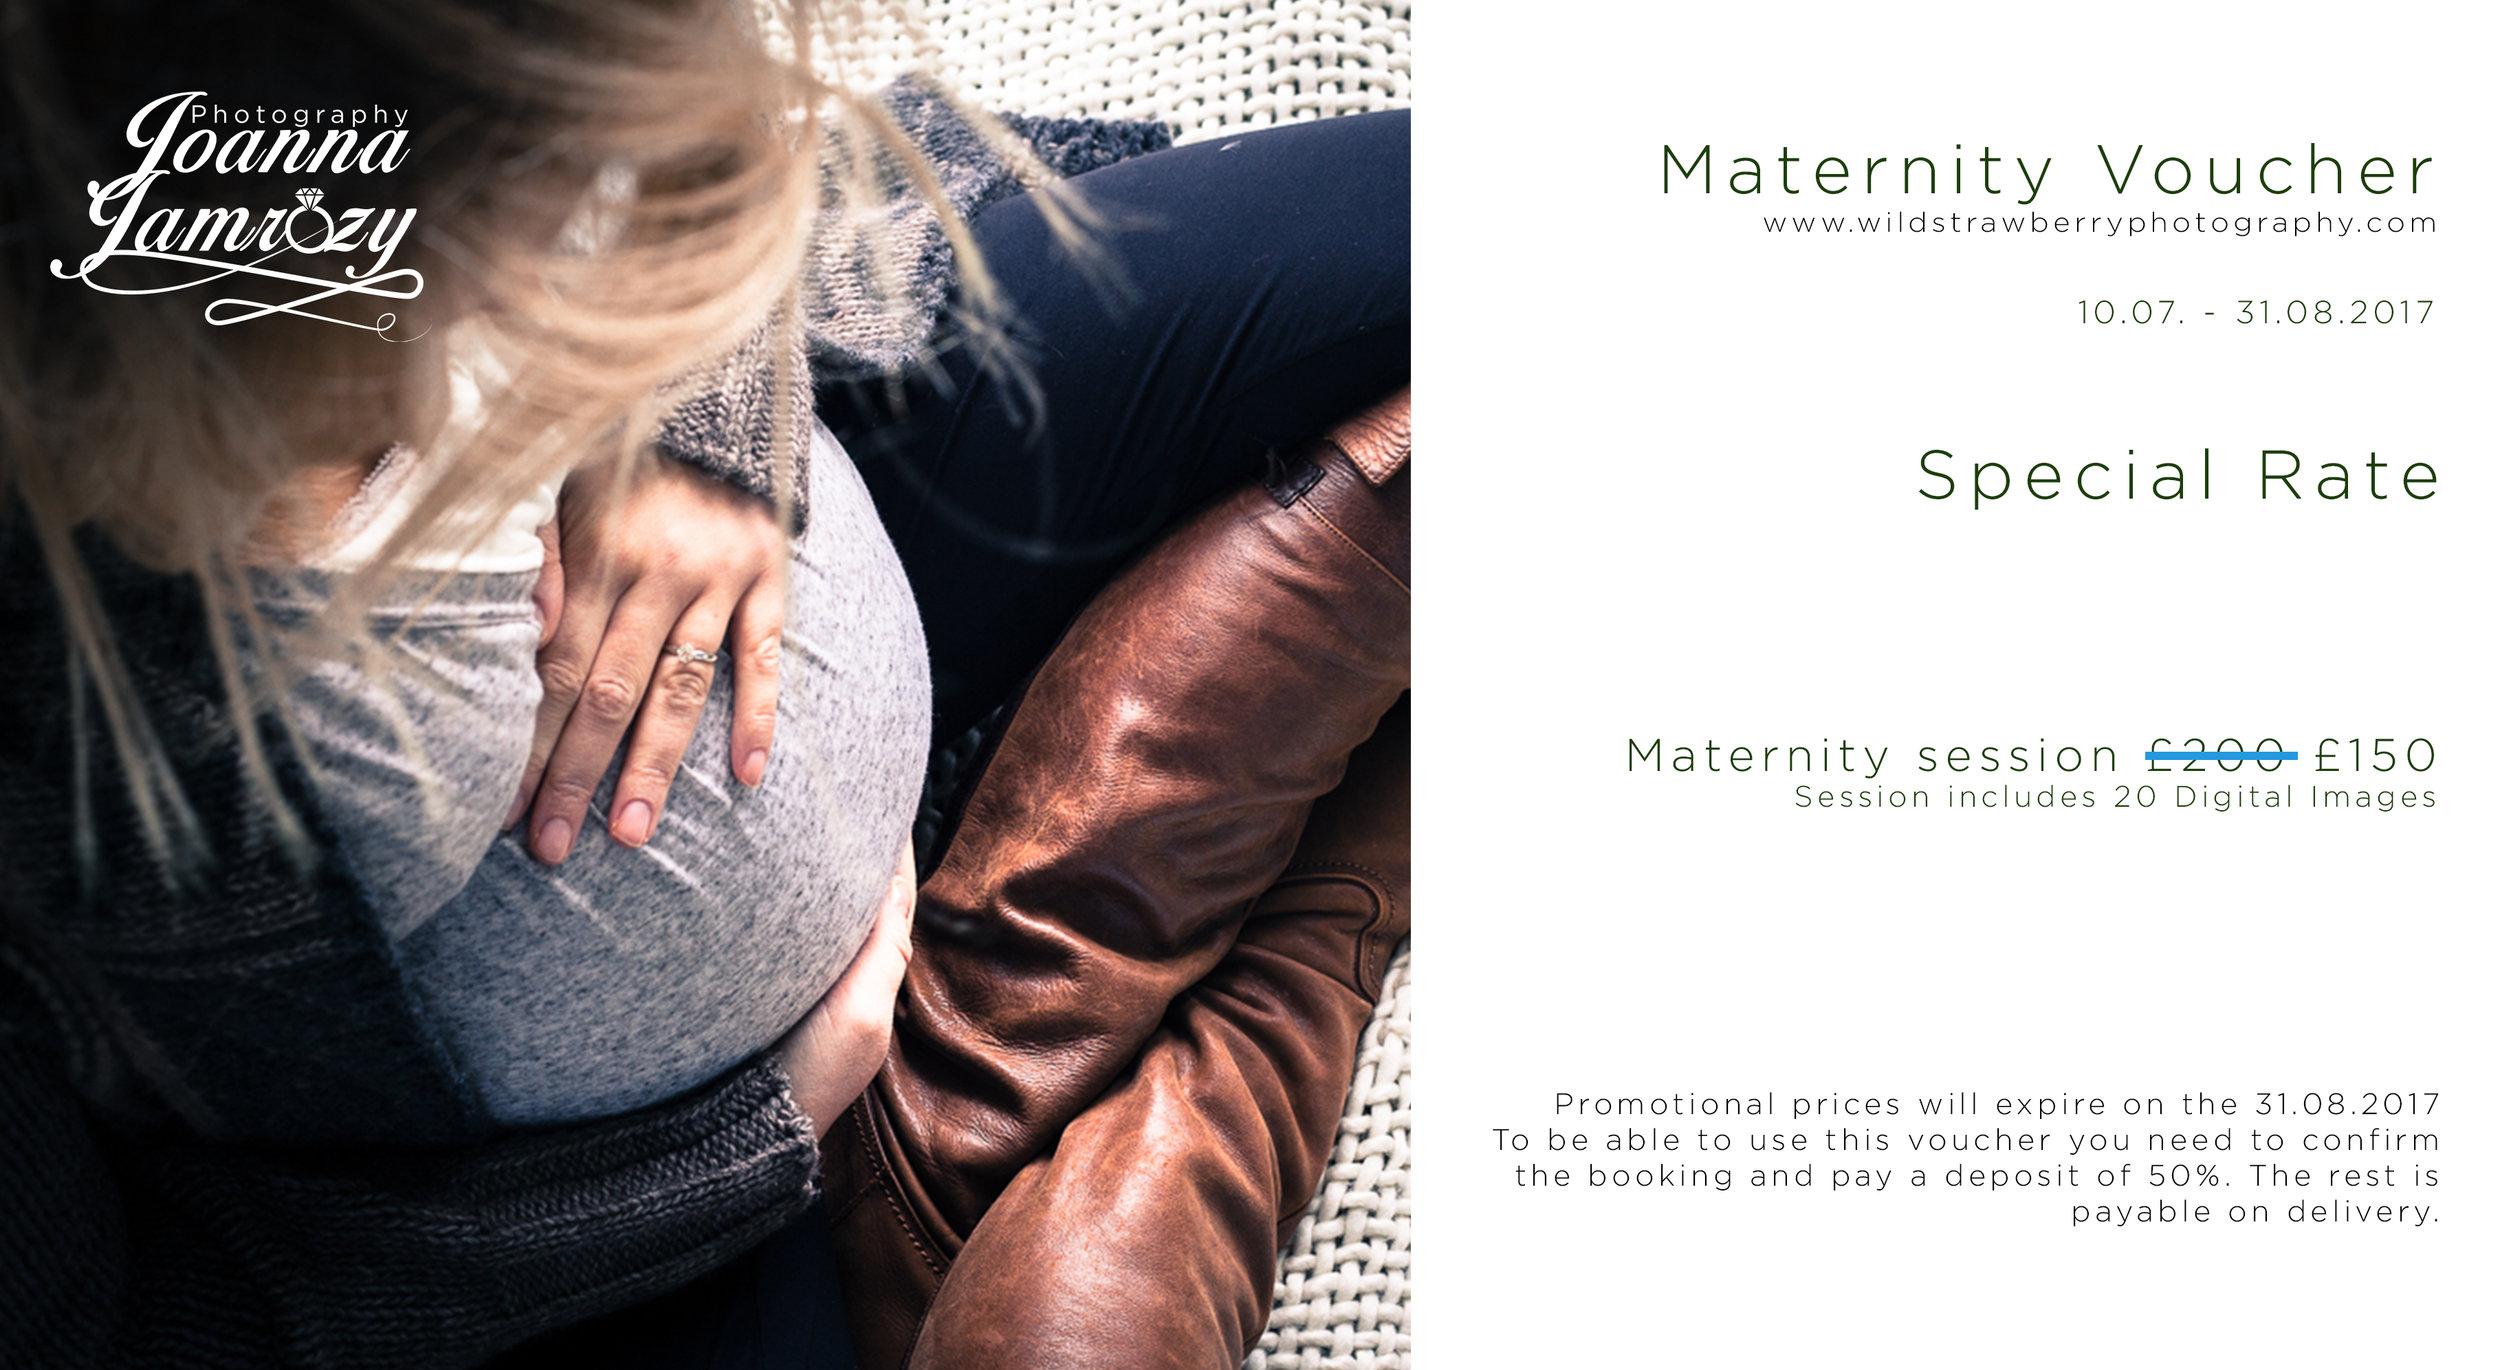 Maternity voucher